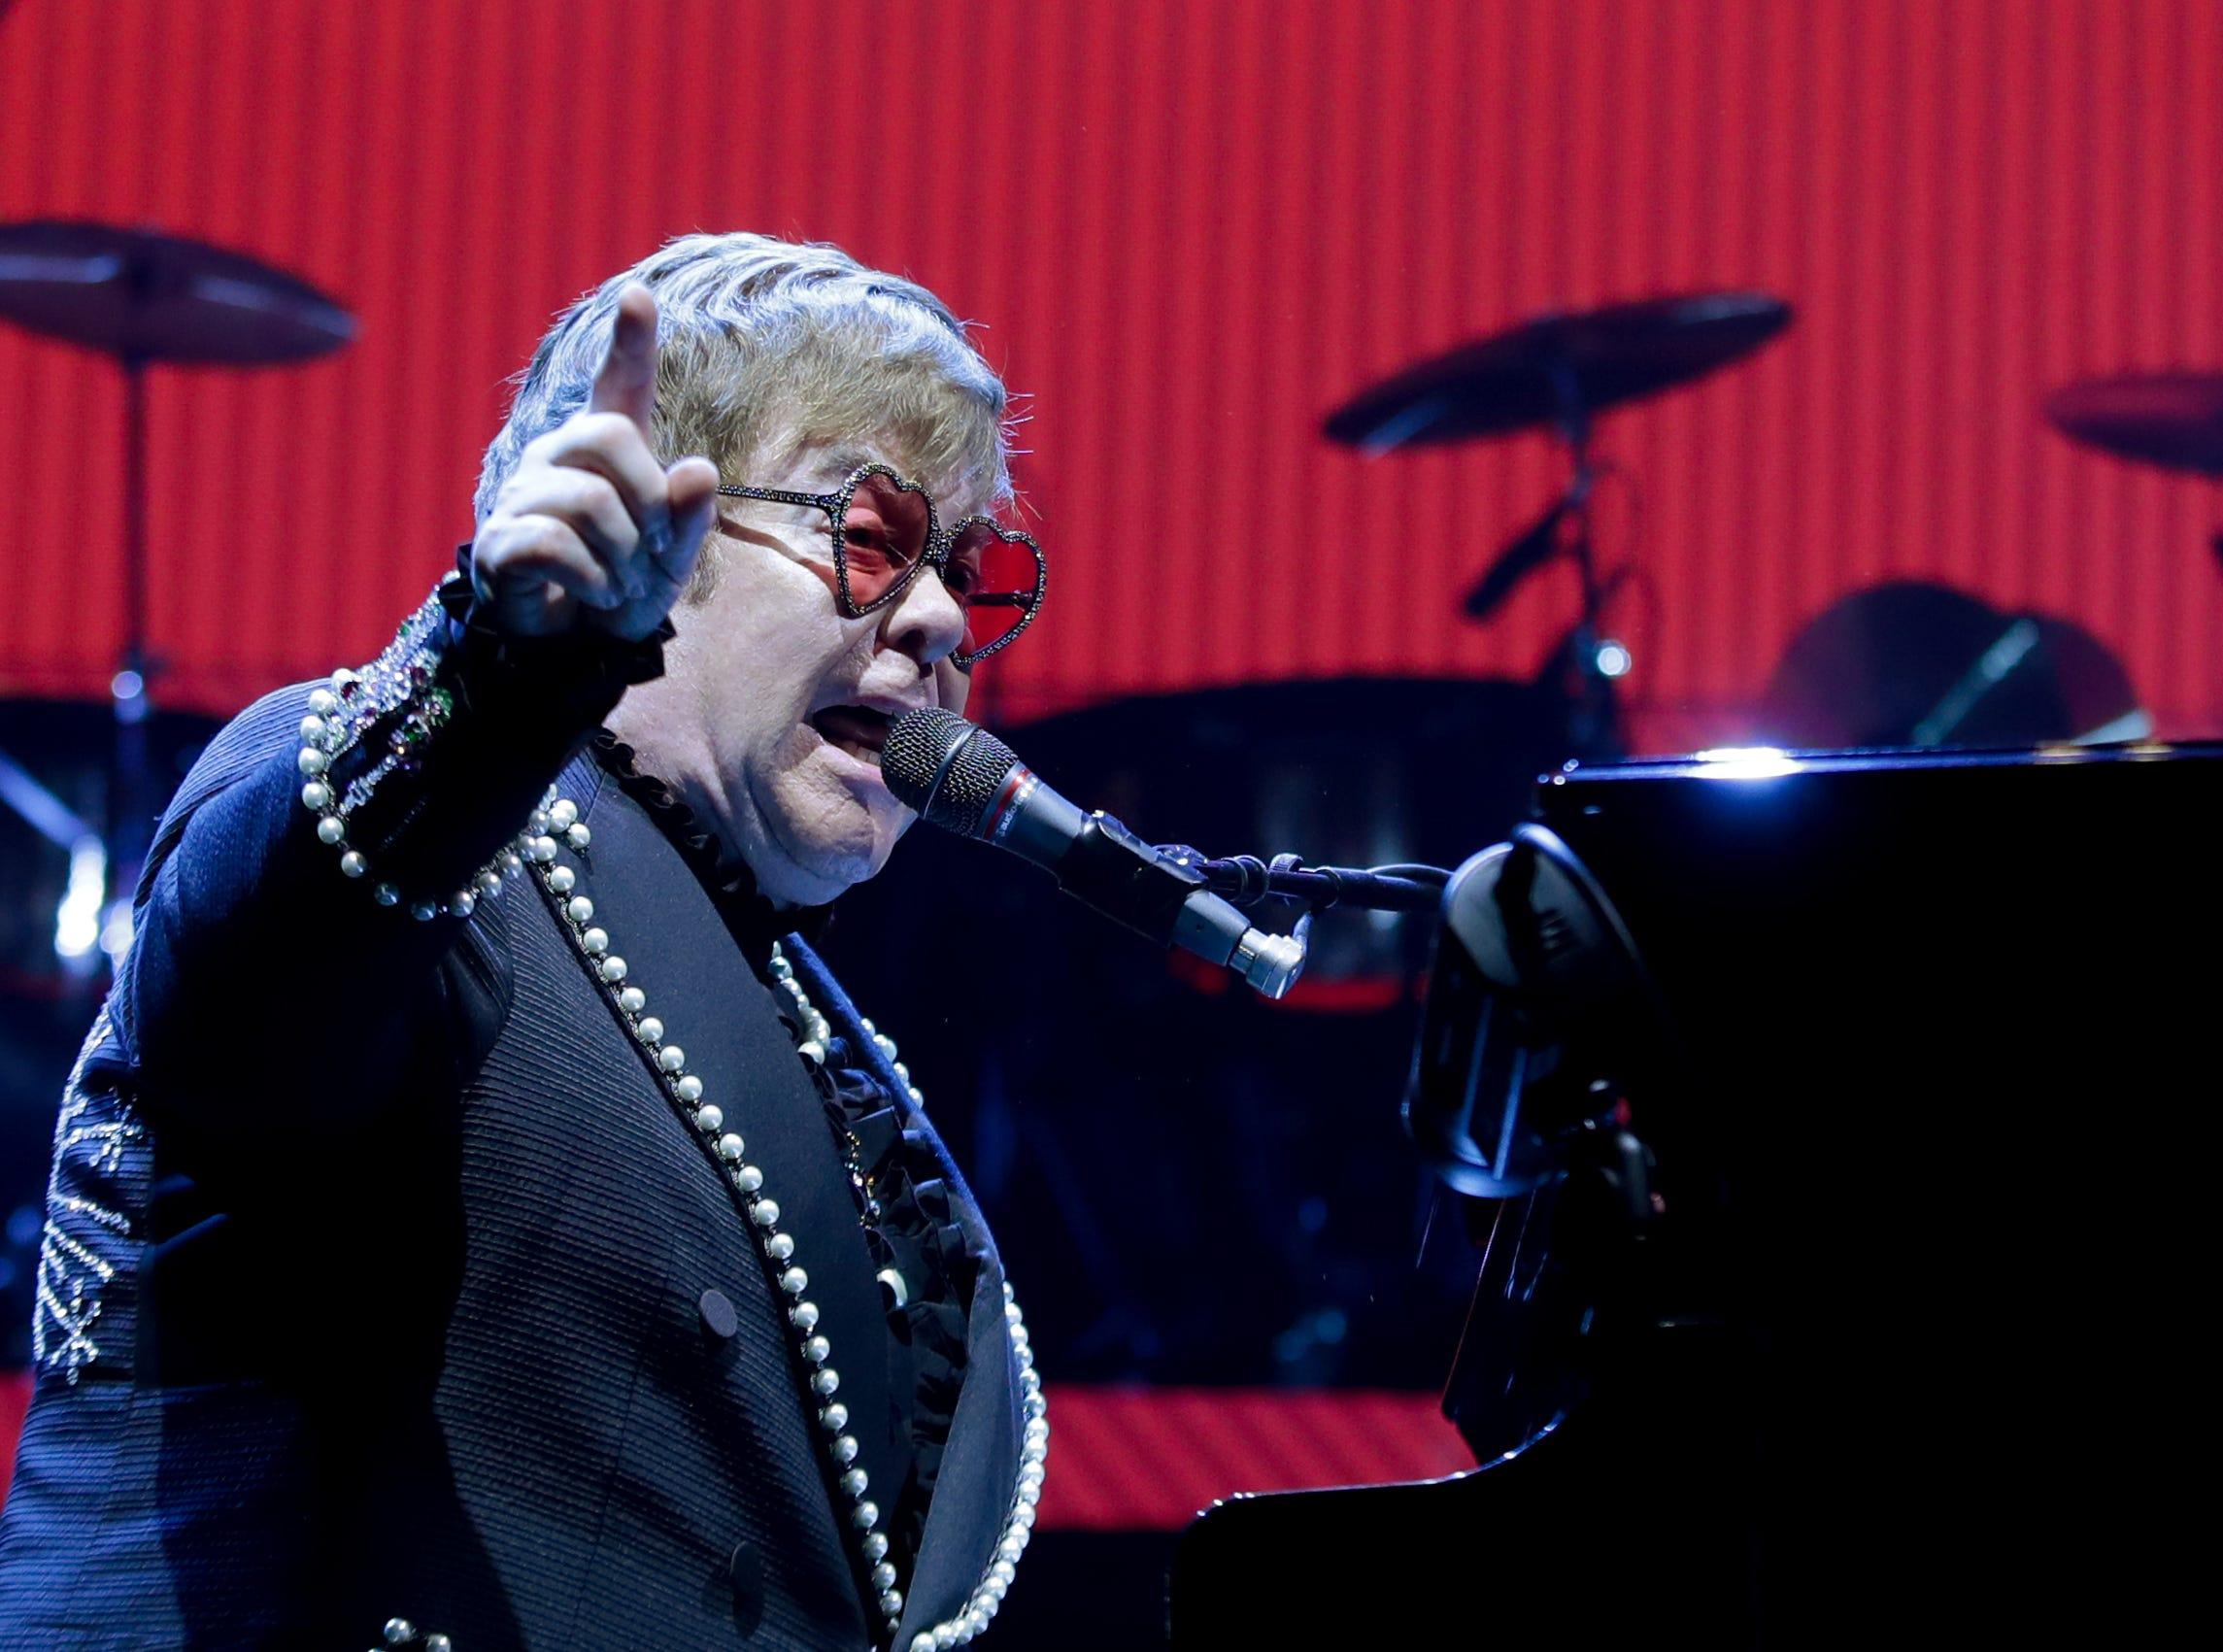 Elton John plays the KFC Yum Center for his Farewell Yellow Brick Road tour. Oct. 23, 2018